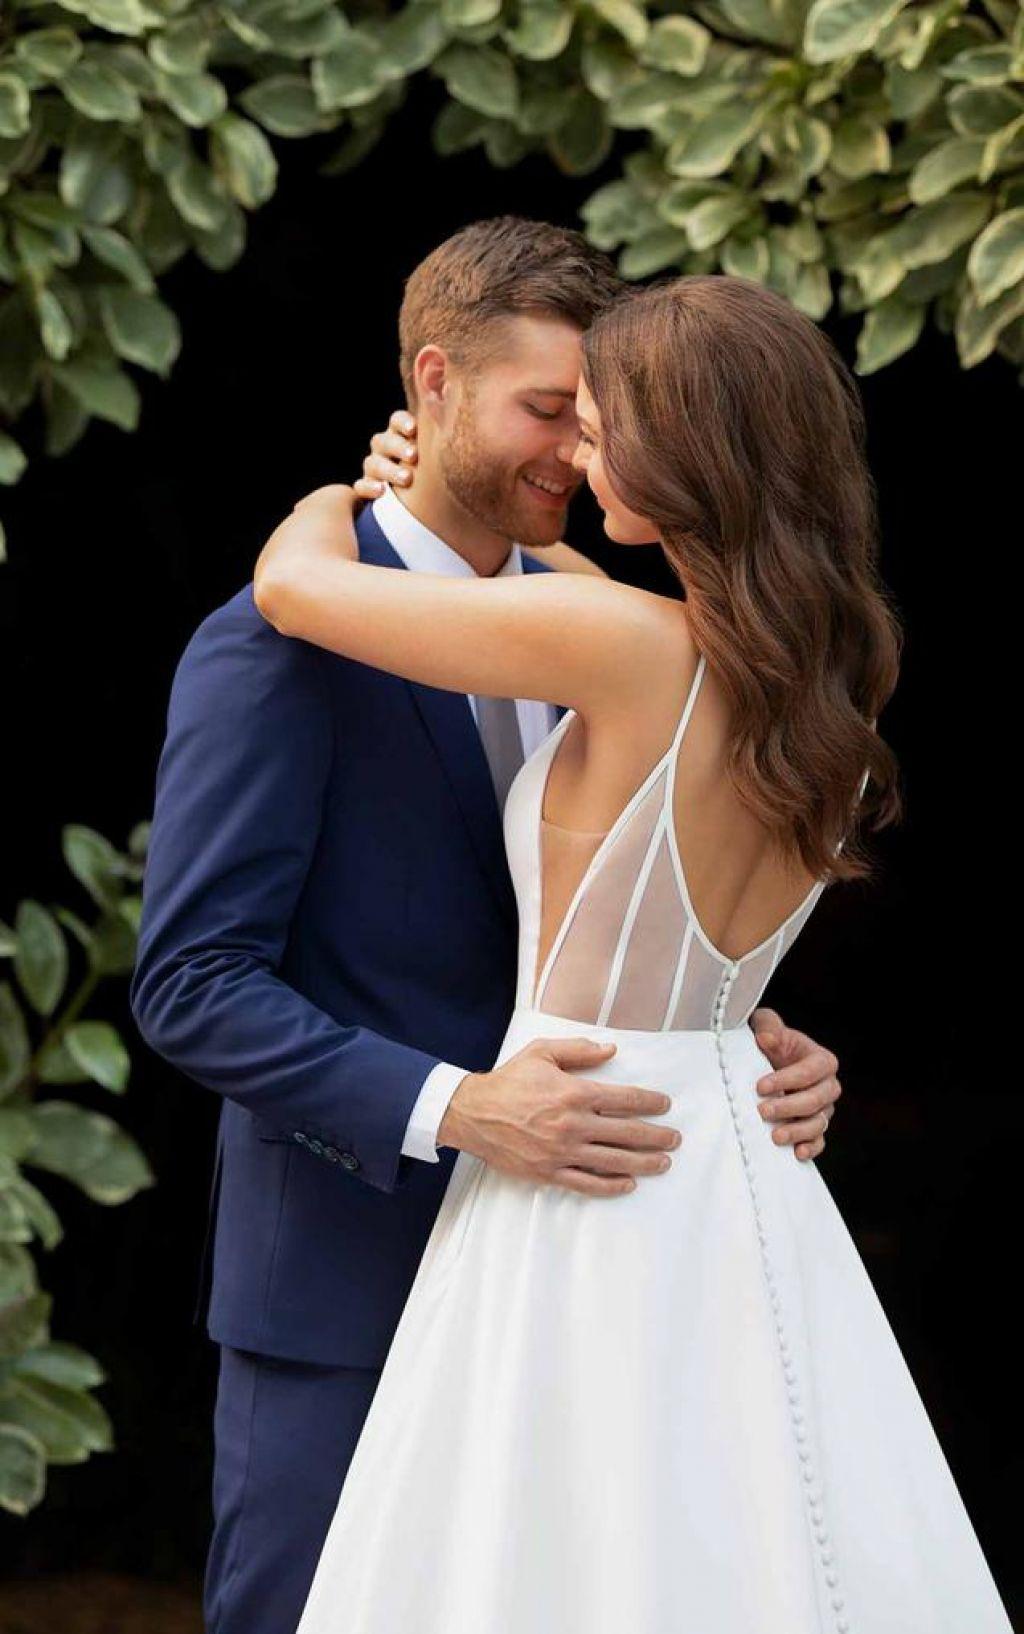 groom hugging bride wearing A-line wedding dress with sheer back